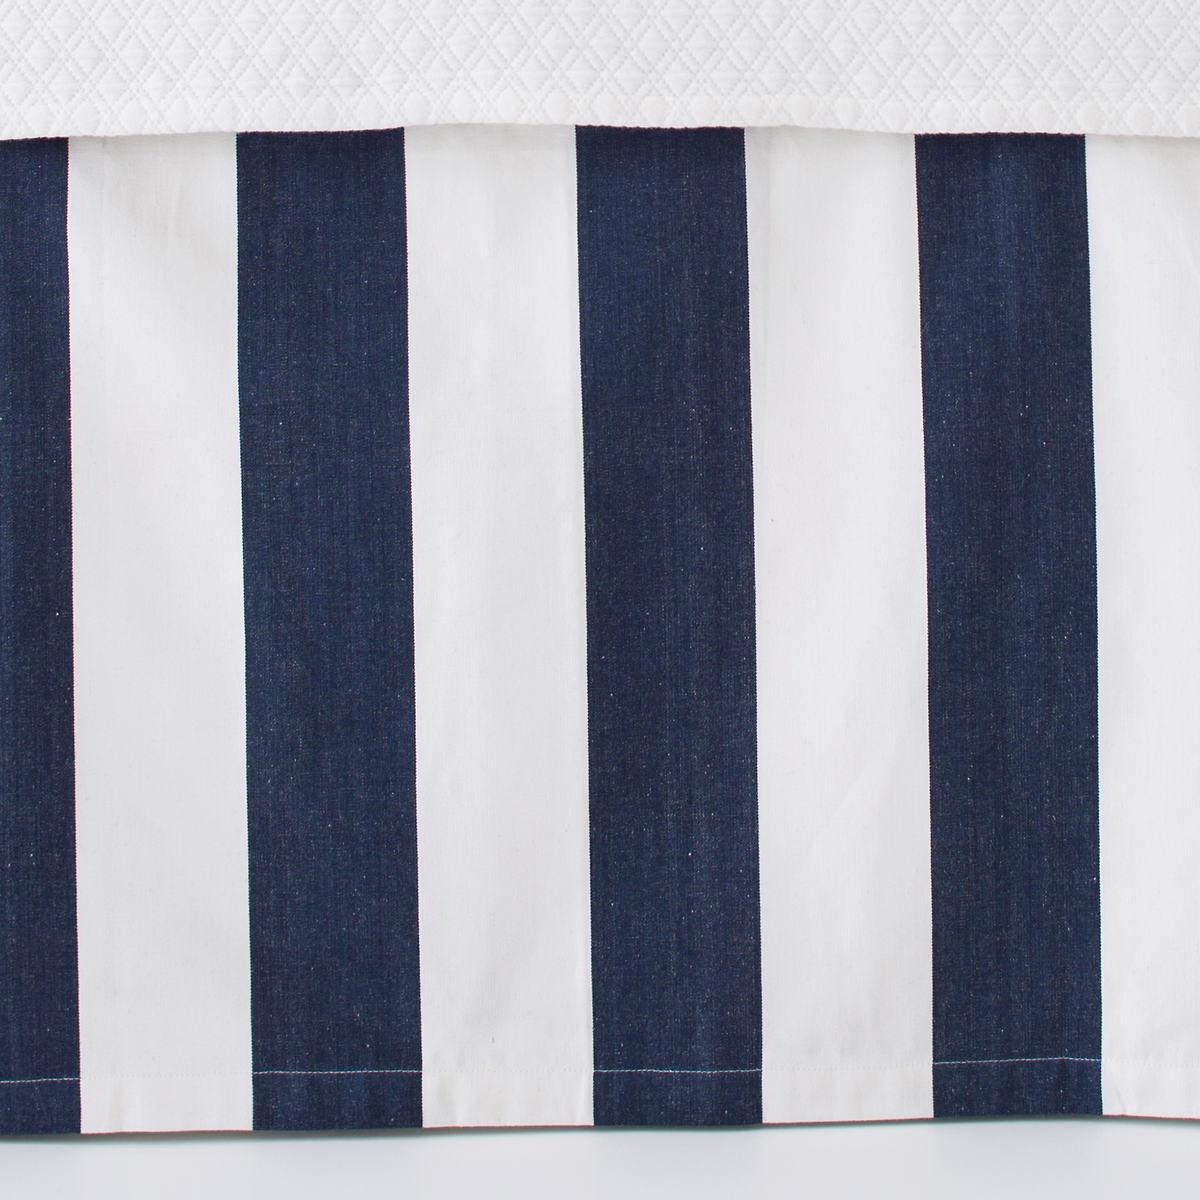 Alex Indigo Paneled Bed Skirt